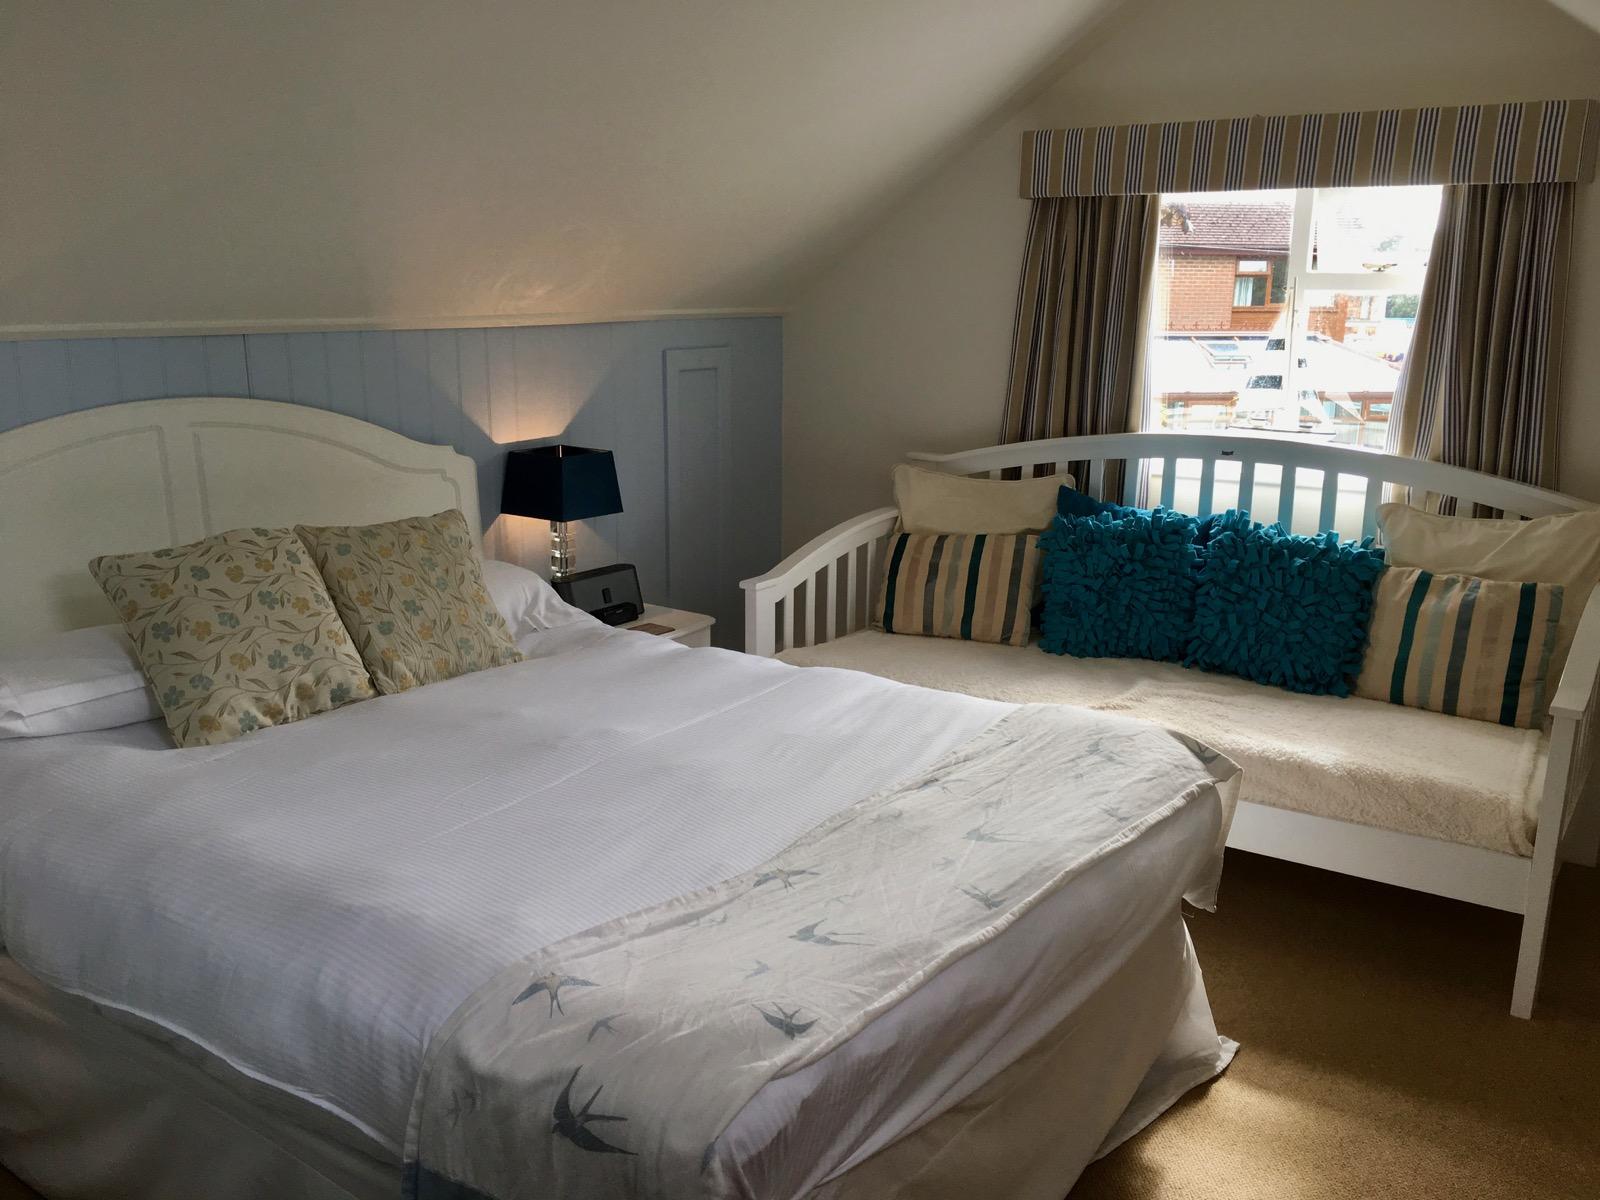 The Fishbourne Ryde King Room Bed